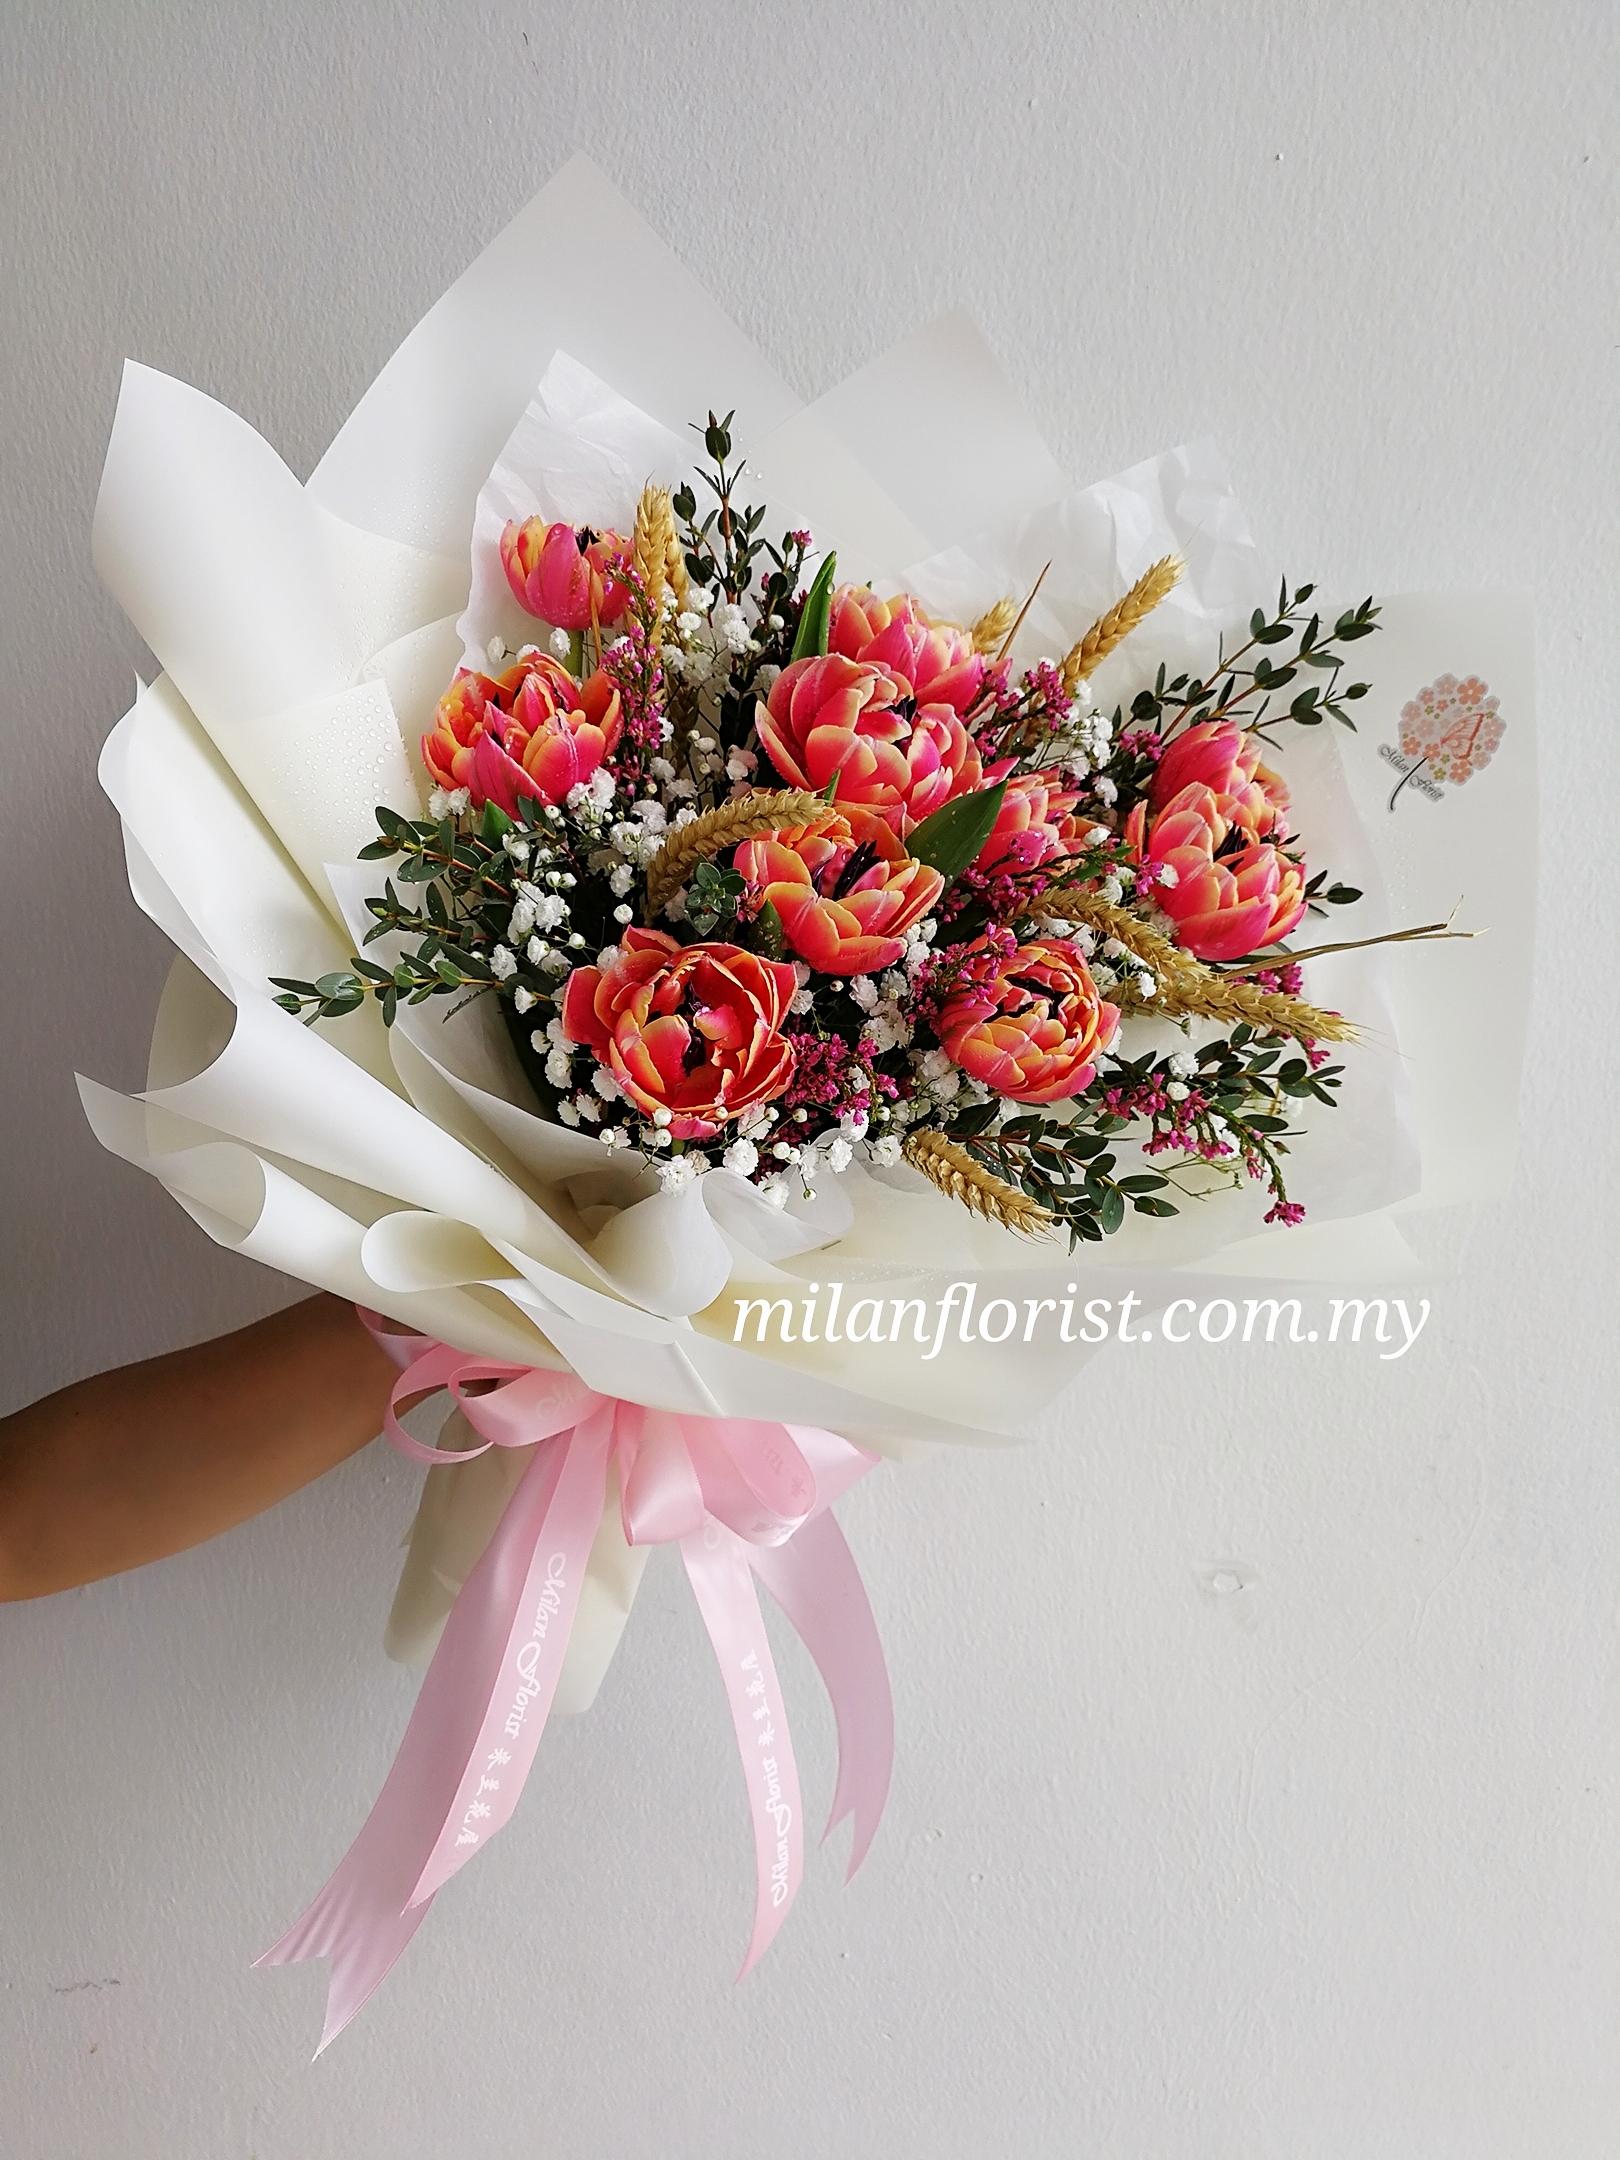 tulip flower bouquet 郁金香花束